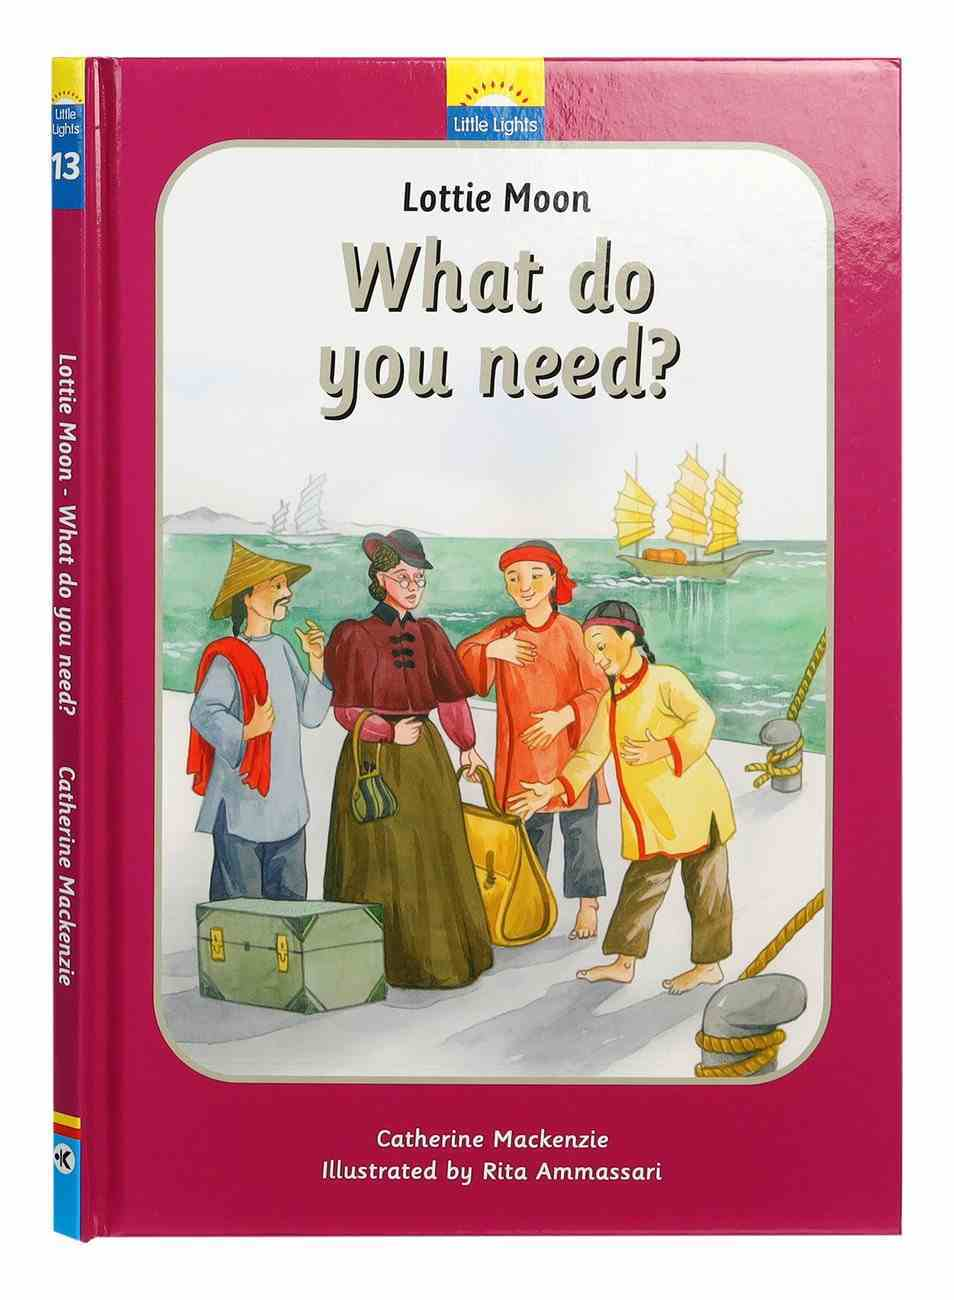 Lottie Moon: What Do You Need? (Little Lights Biography Series) Hardback